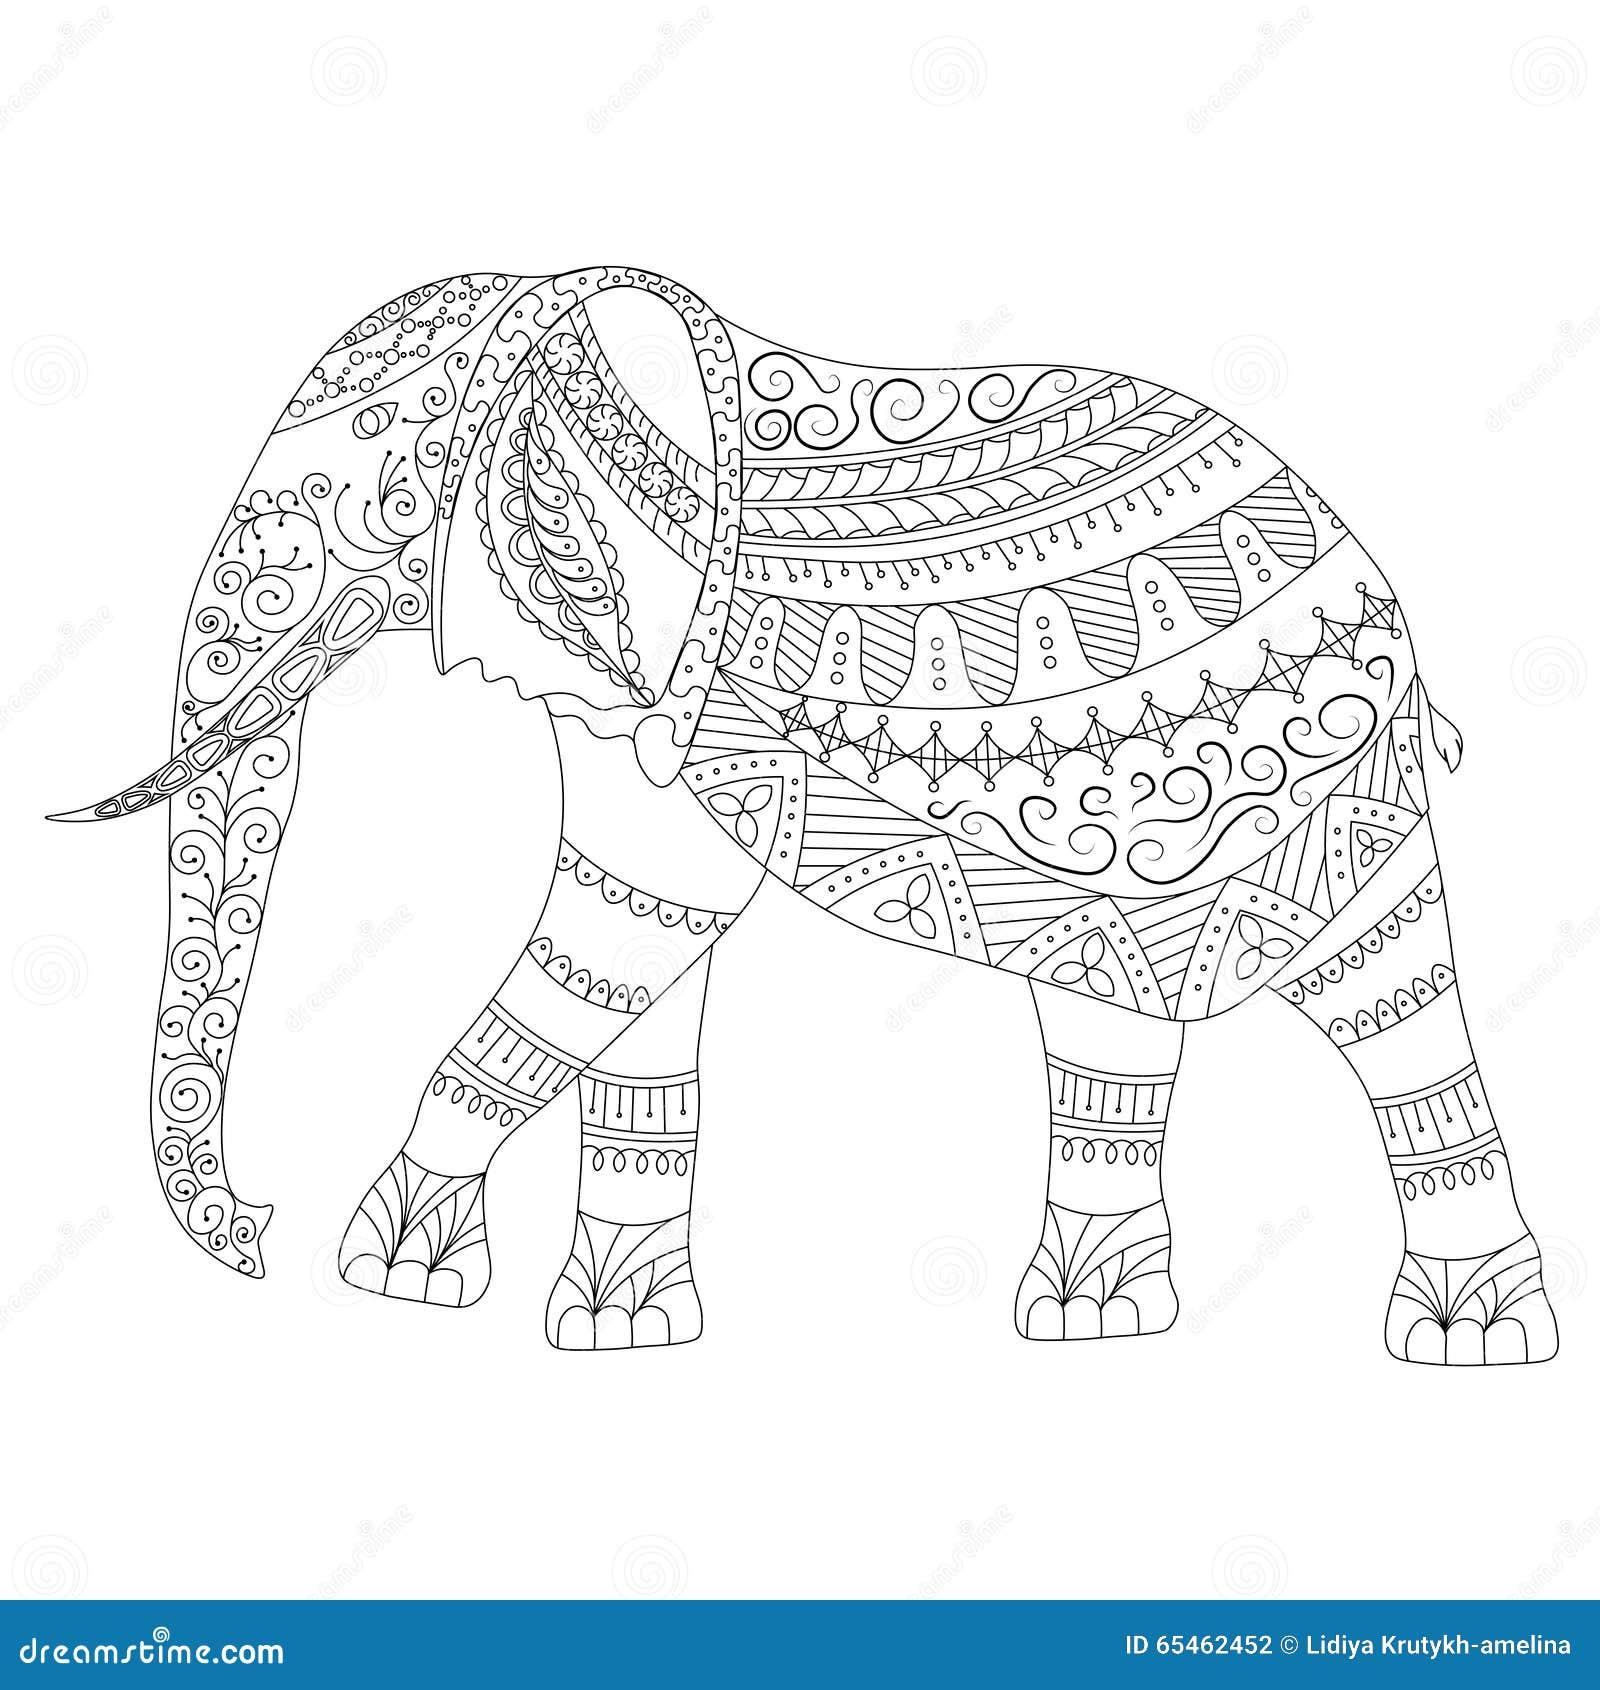 zentangle elephant doodle on white background stock vector illustration of black mosaic 65462452. Black Bedroom Furniture Sets. Home Design Ideas